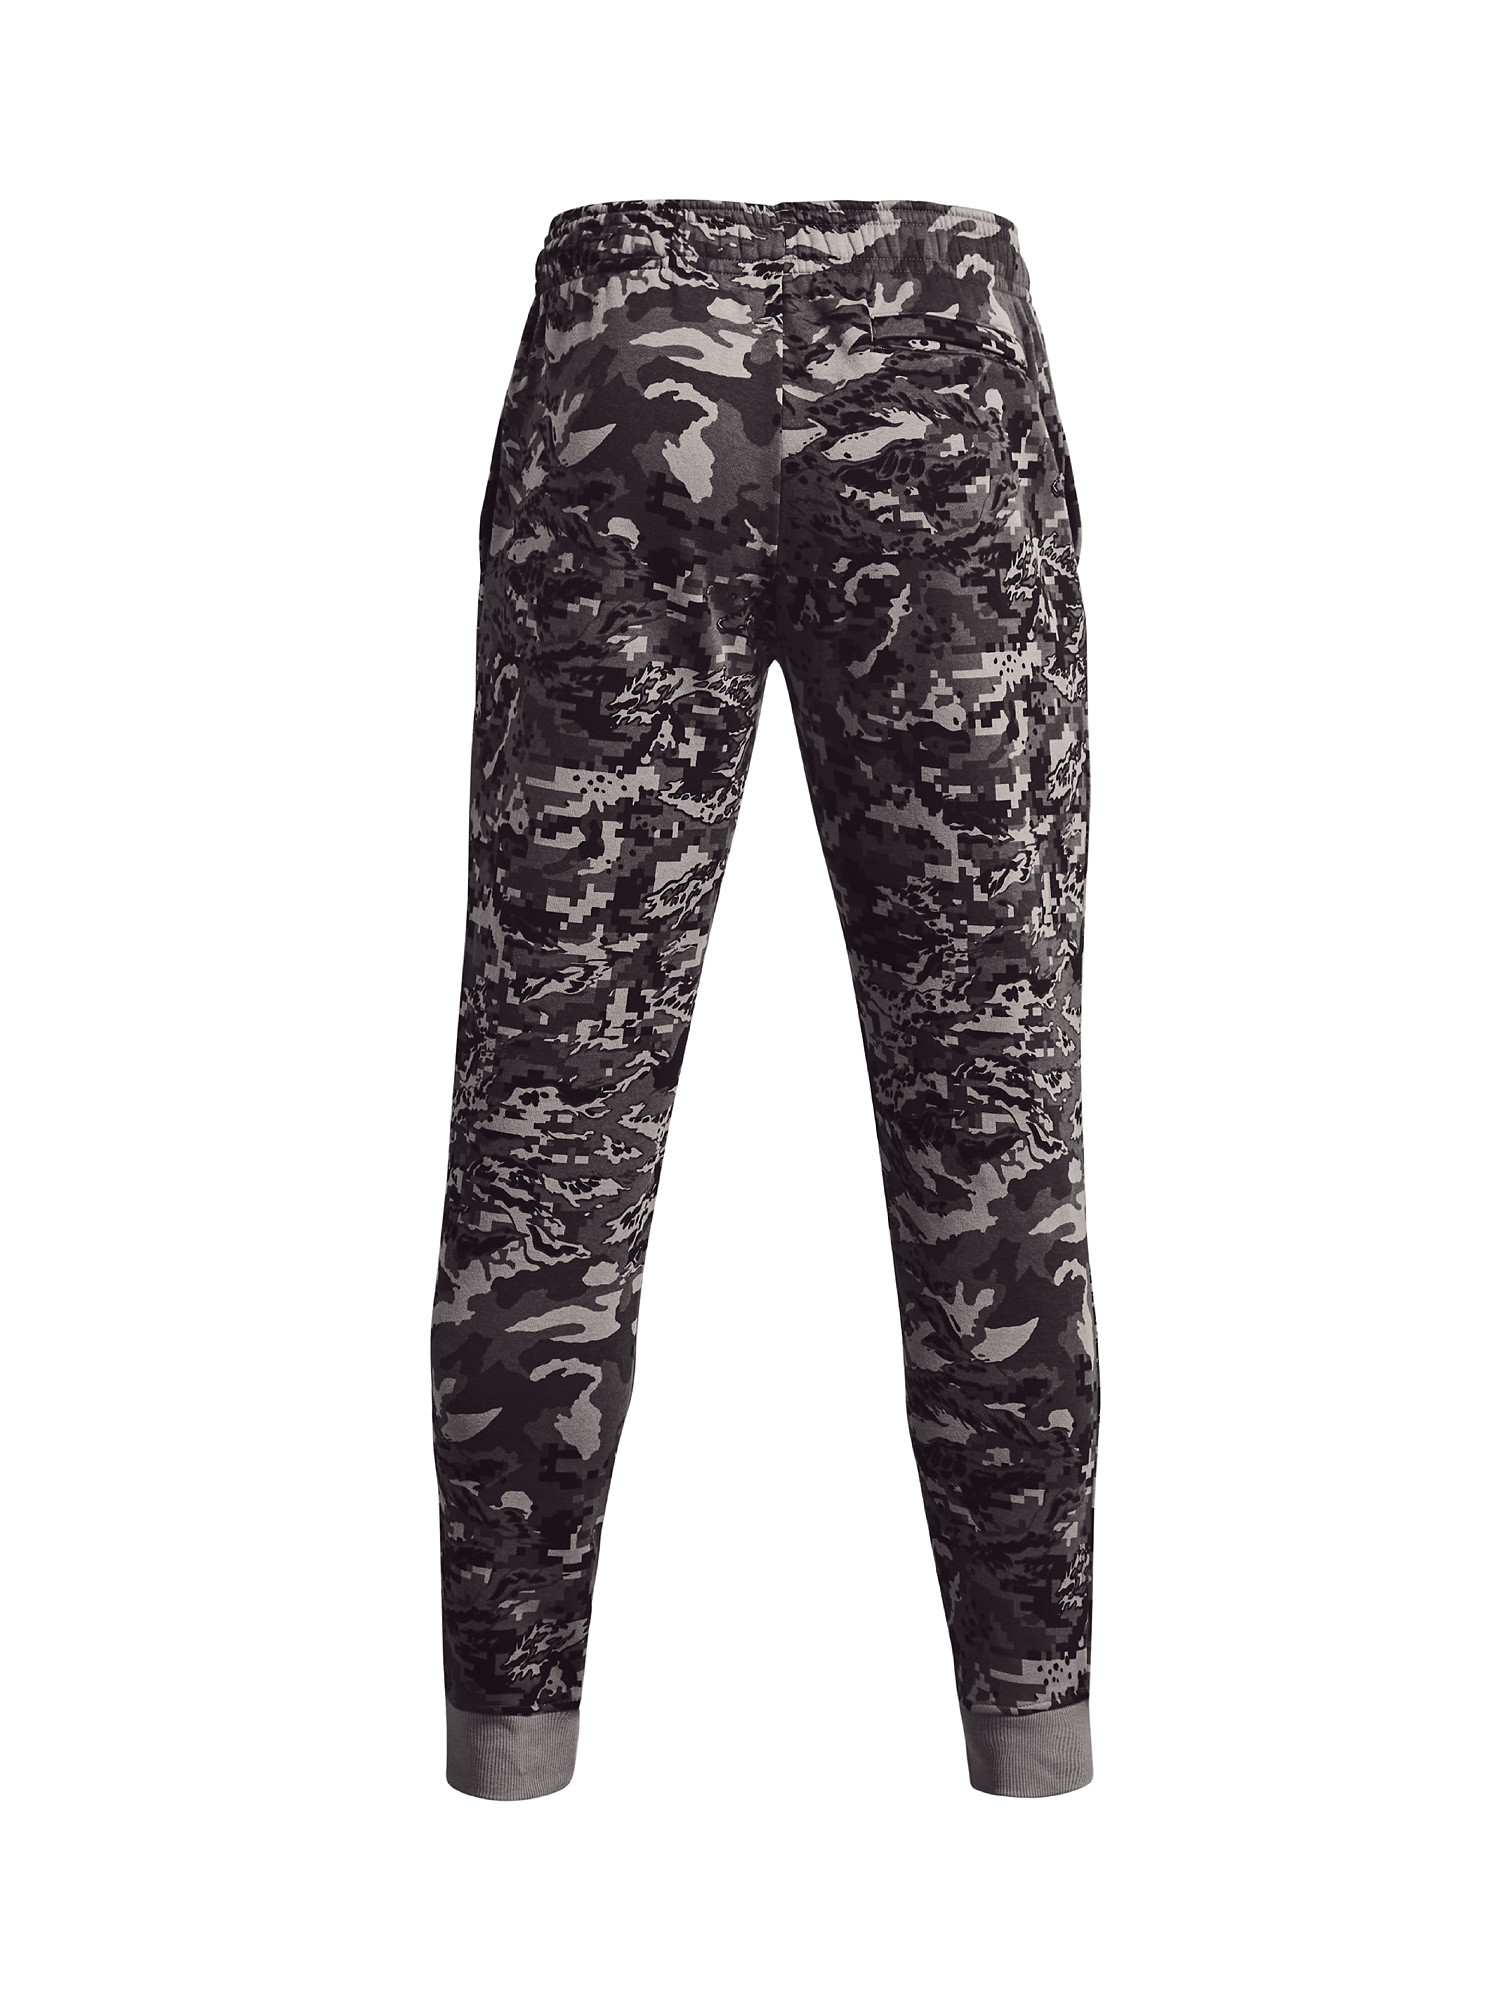 Pantaloni sportivi, Marrone, large image number 1